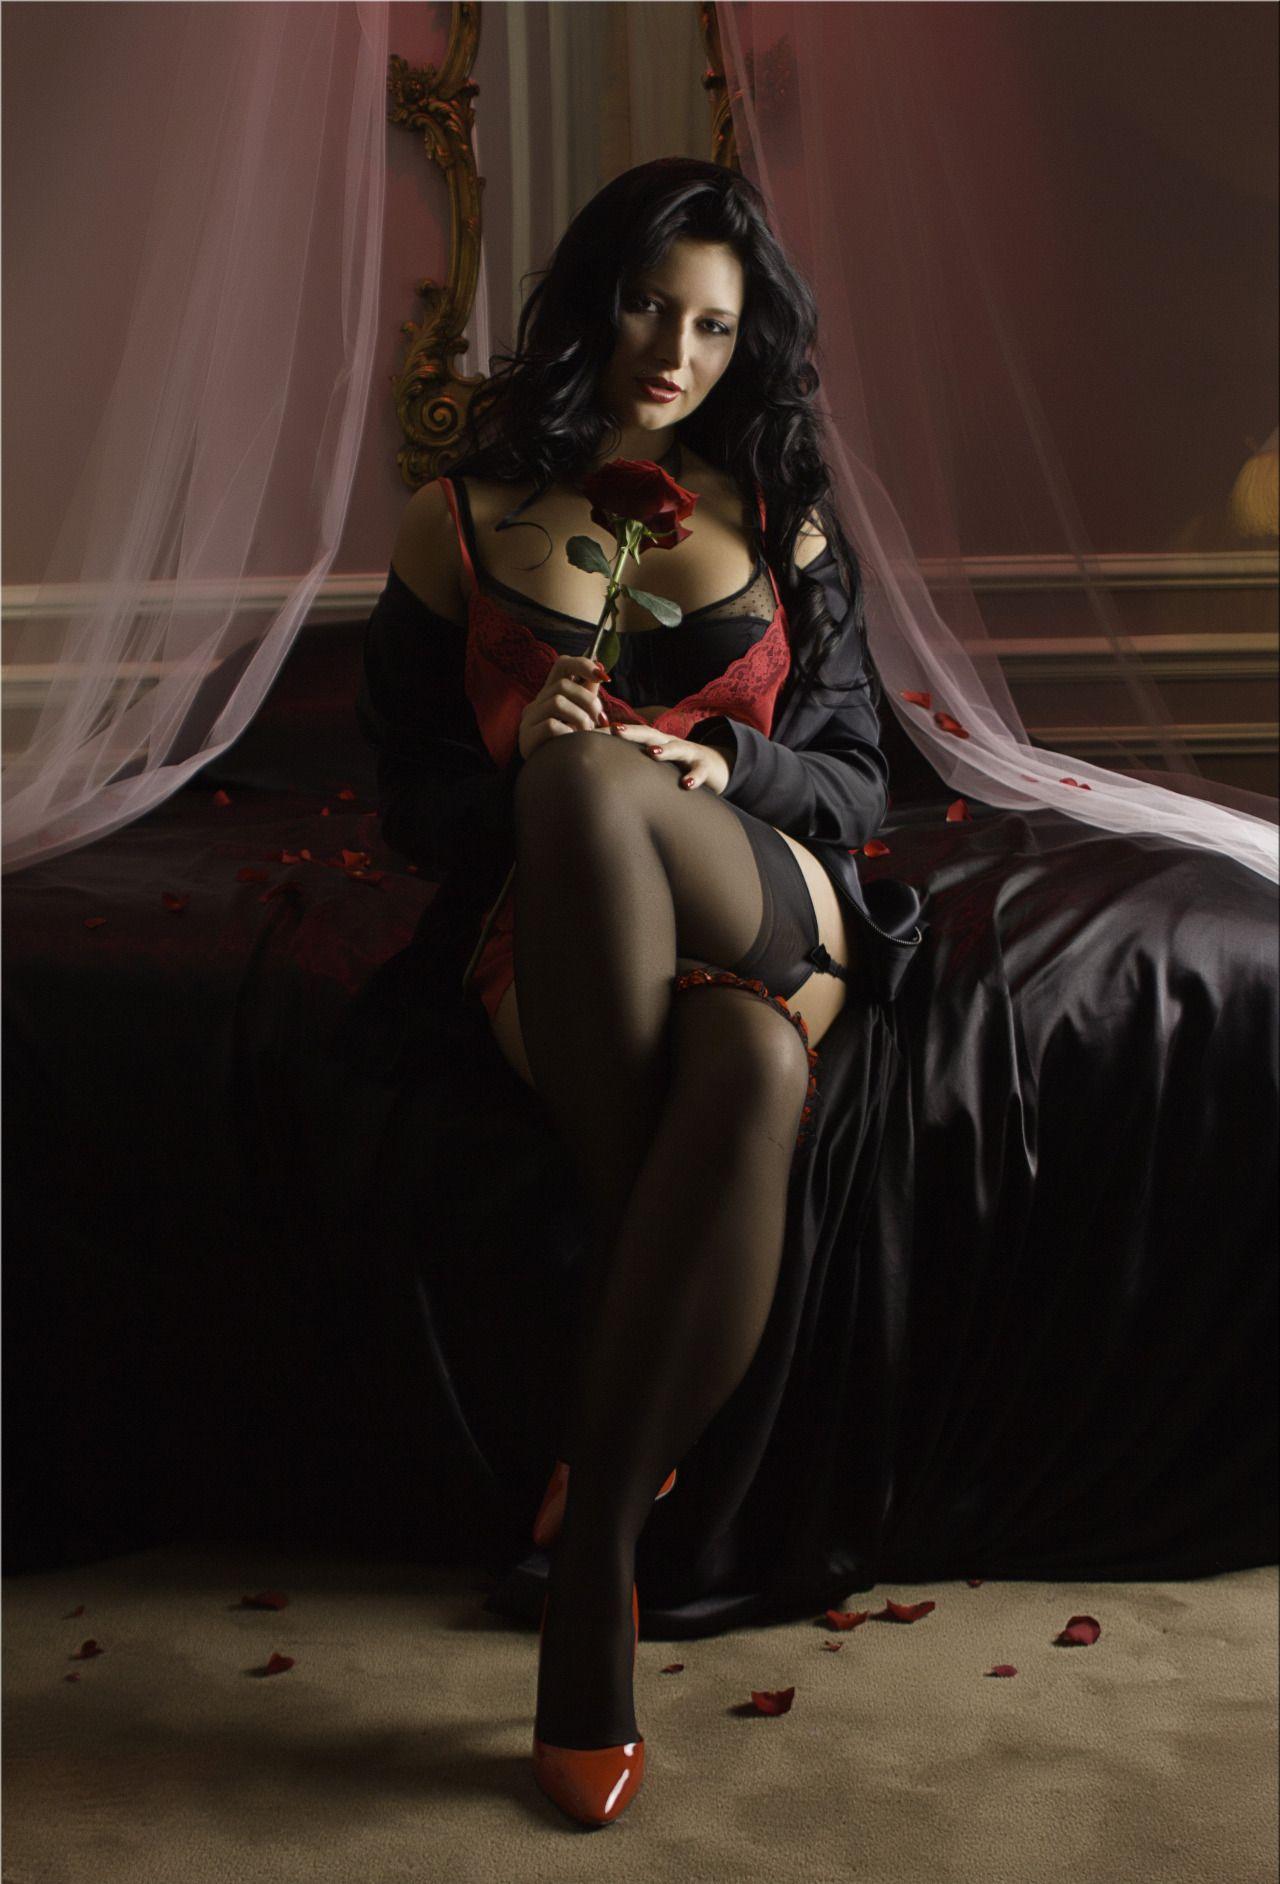 french pornstar anna polina | femmes françaises | pinterest | man